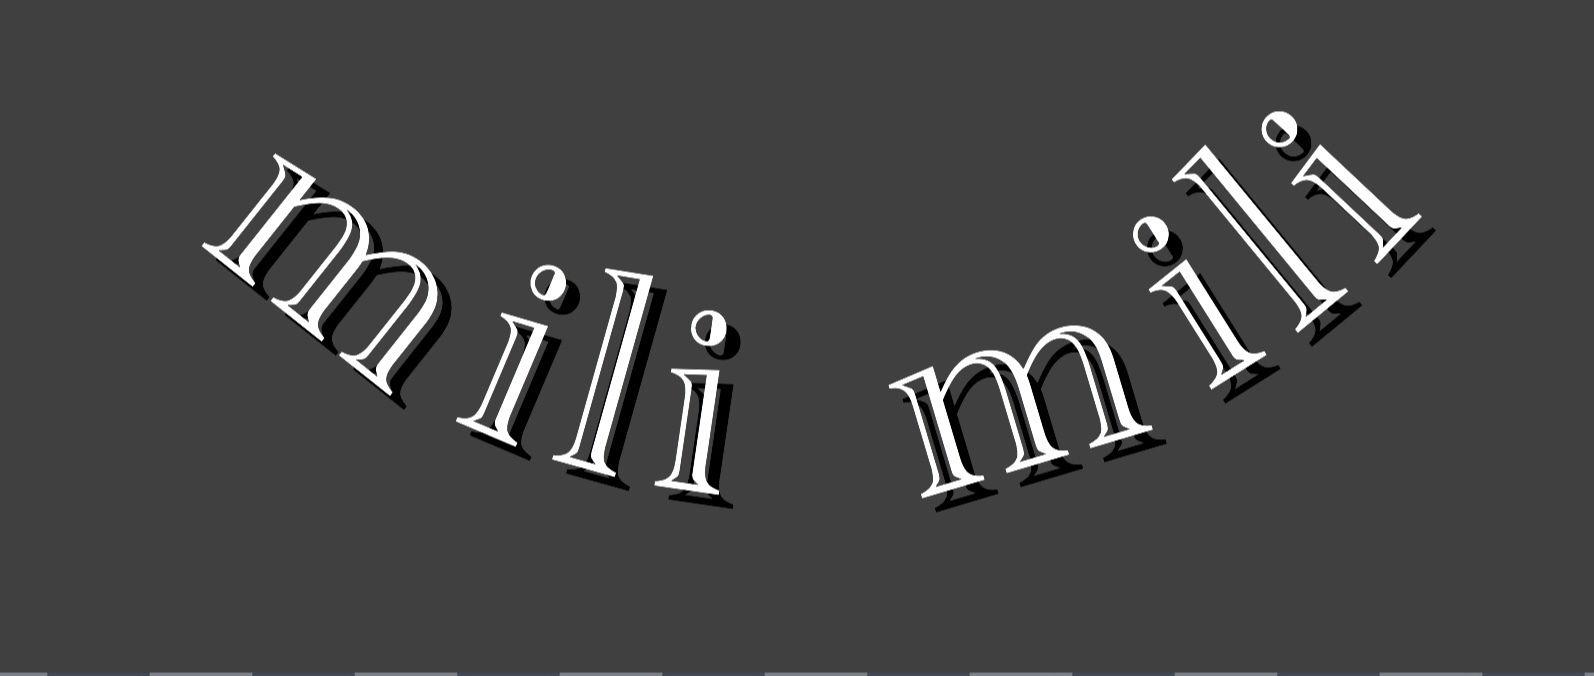 milimili